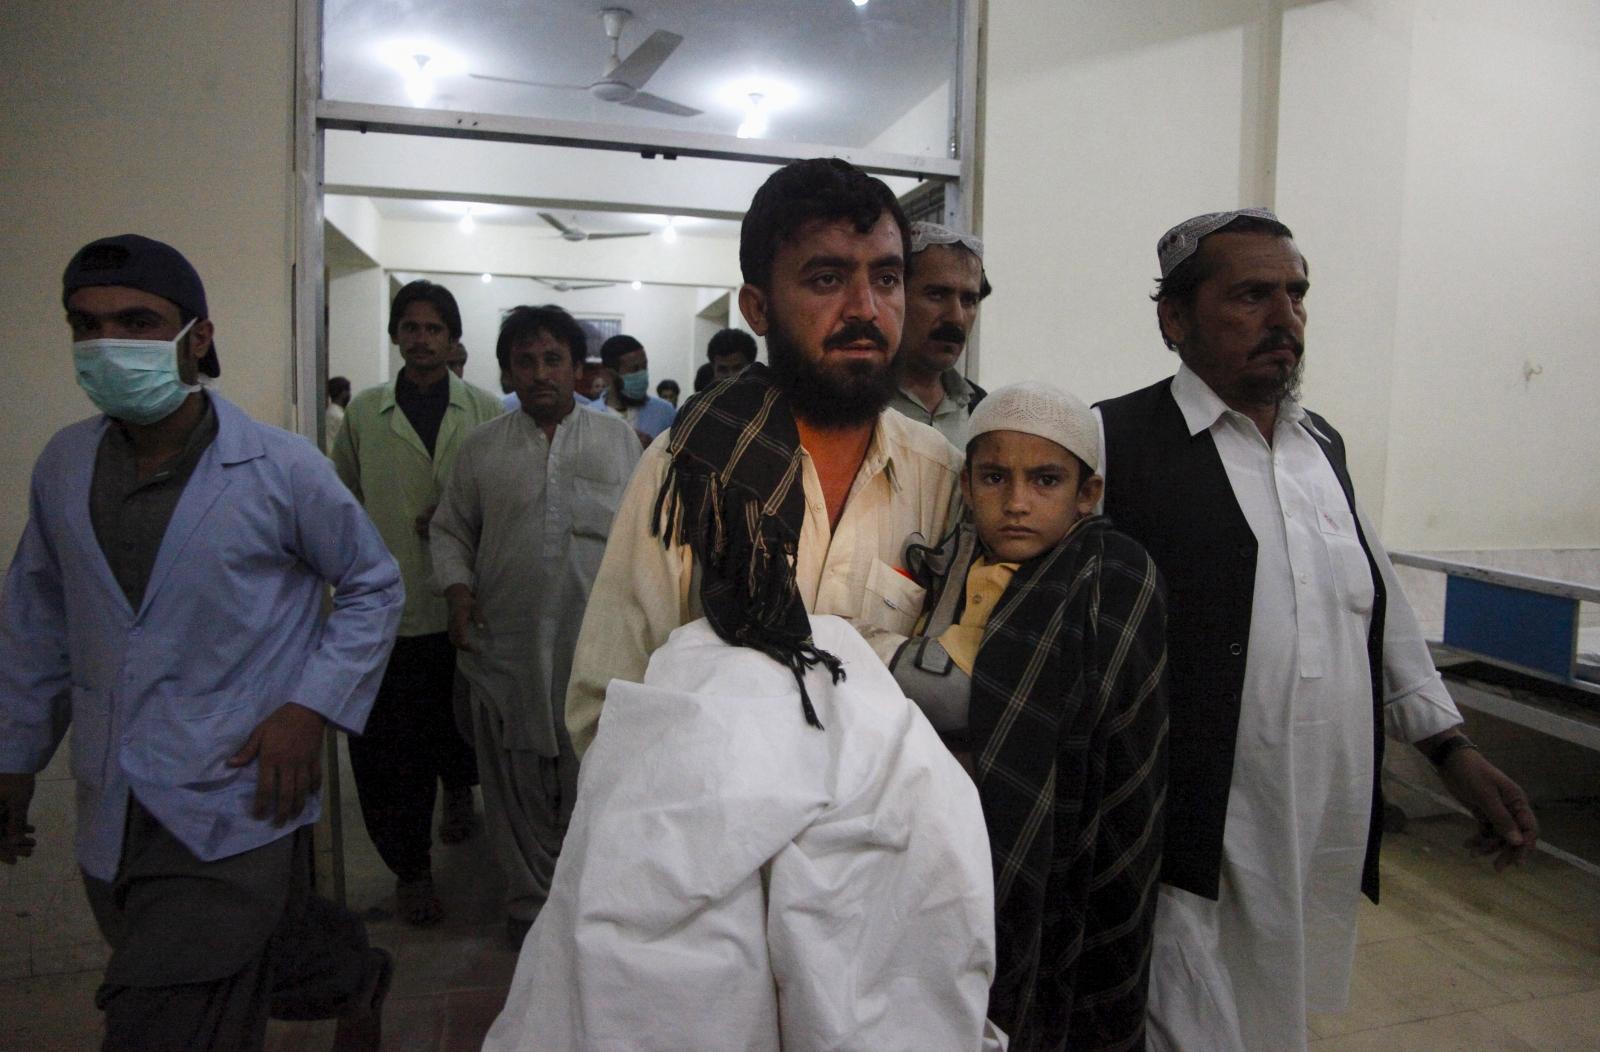 Pakistan Karachi bus attack